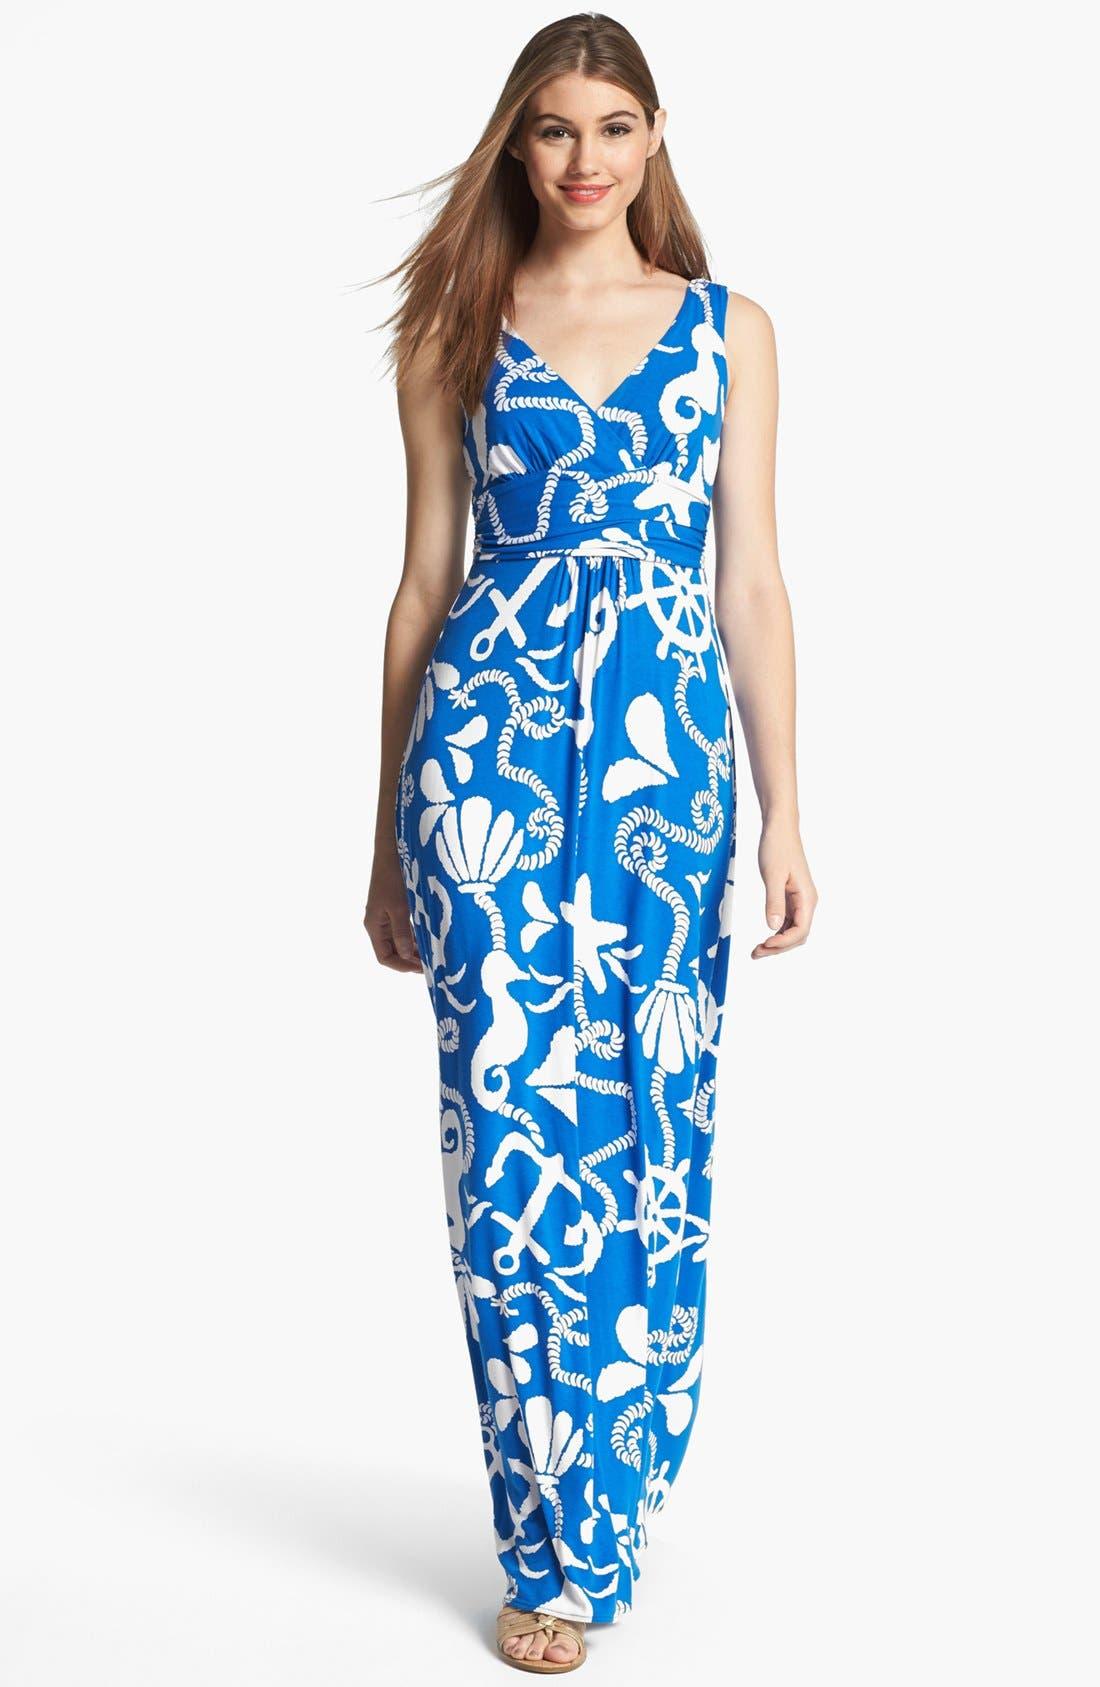 Alternate Image 1 Selected - Lilly Pulitzer® 'Sloane' Maxi Dress